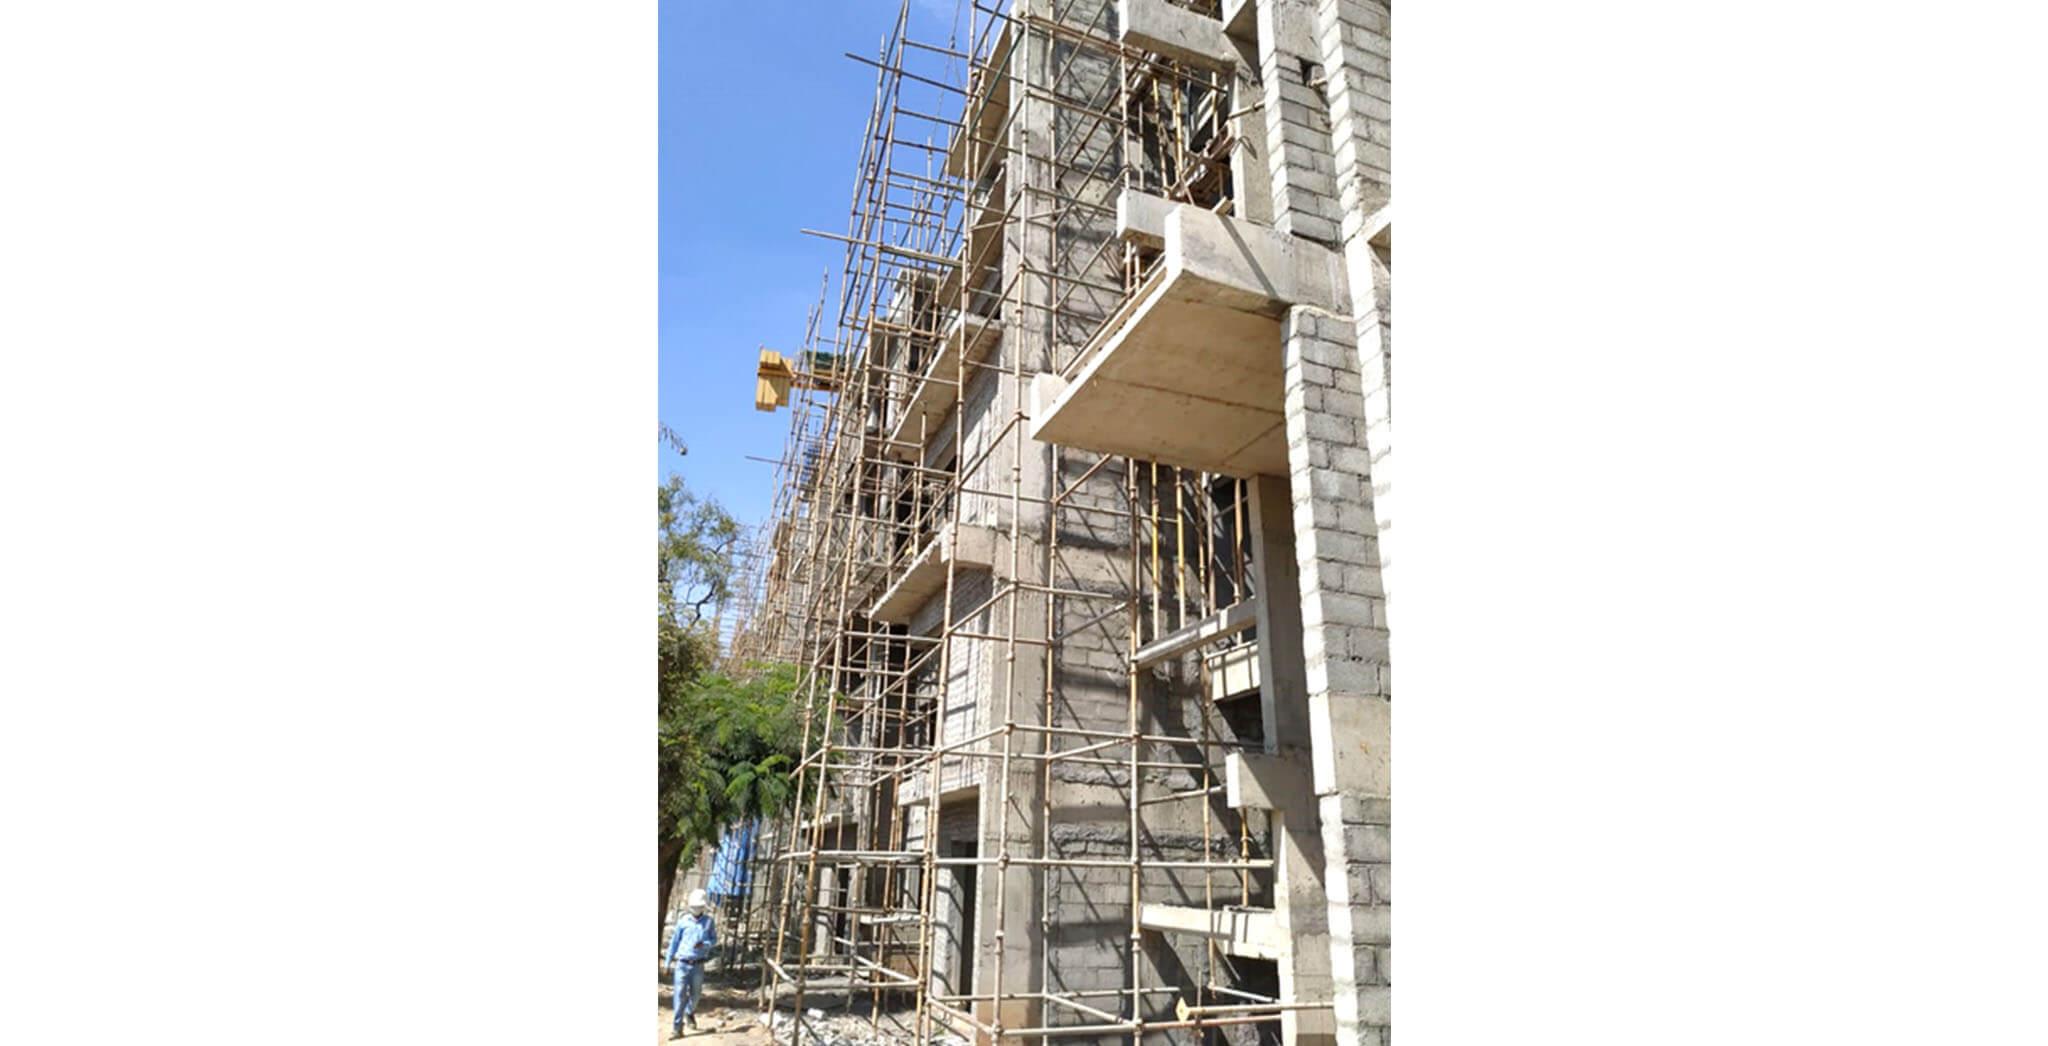 Dec 2020 - J Block: South elevation external plastering work-in-progress.